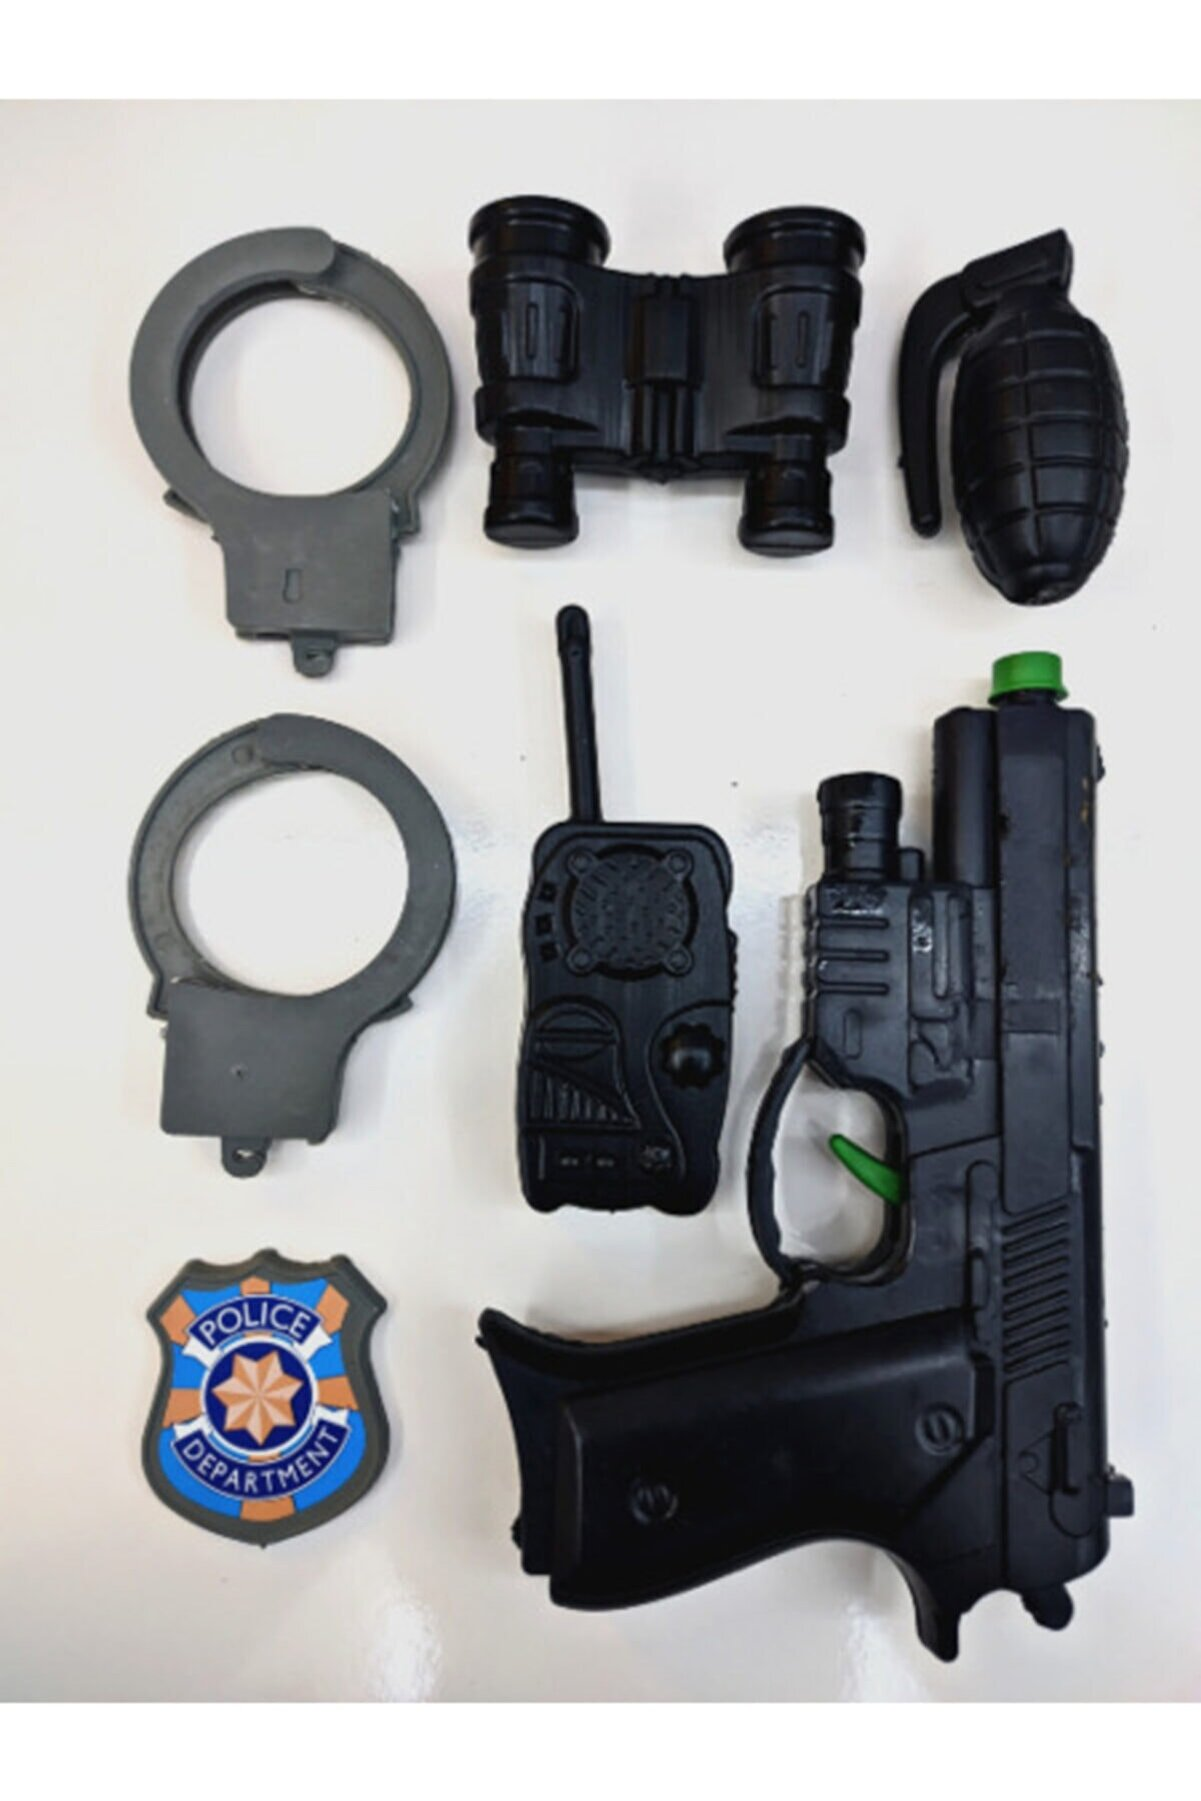 SLV 7 Parça Polis Oyuncak Seti Sesli Glock Tabanca Bomba Dürbün Polis Rozeti Kelepçe Telsiz